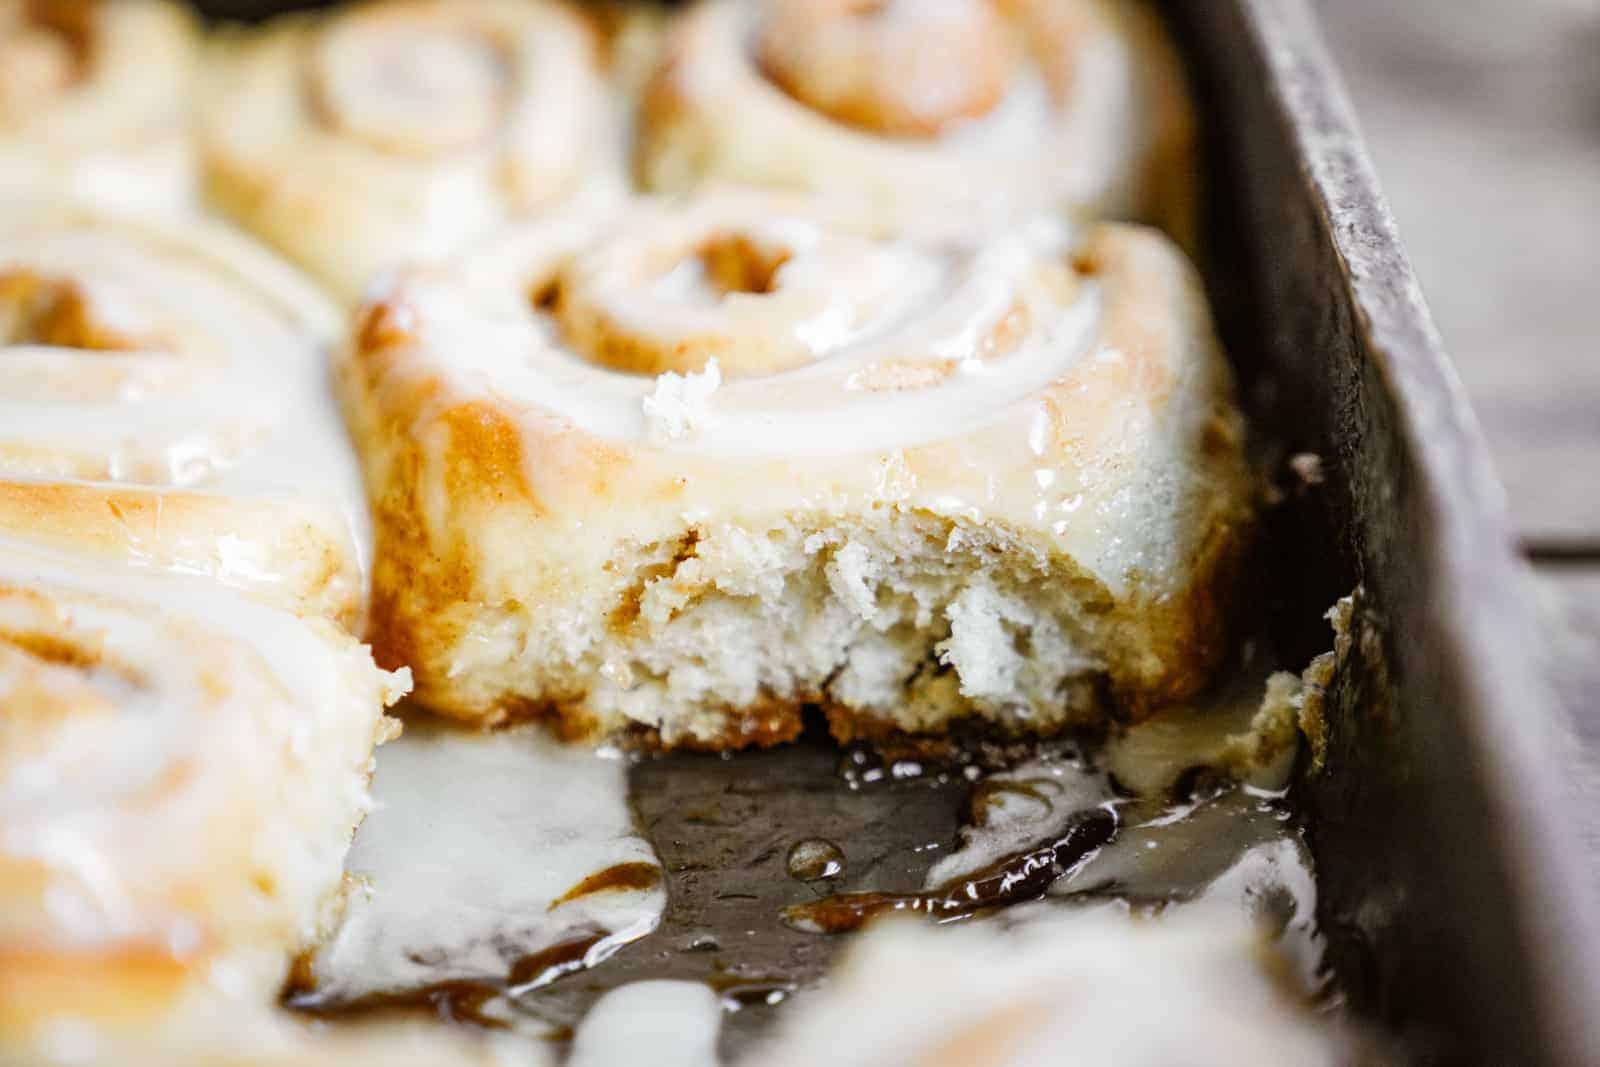 Close-up of Vegan Cinnamon Buns in baking dish.